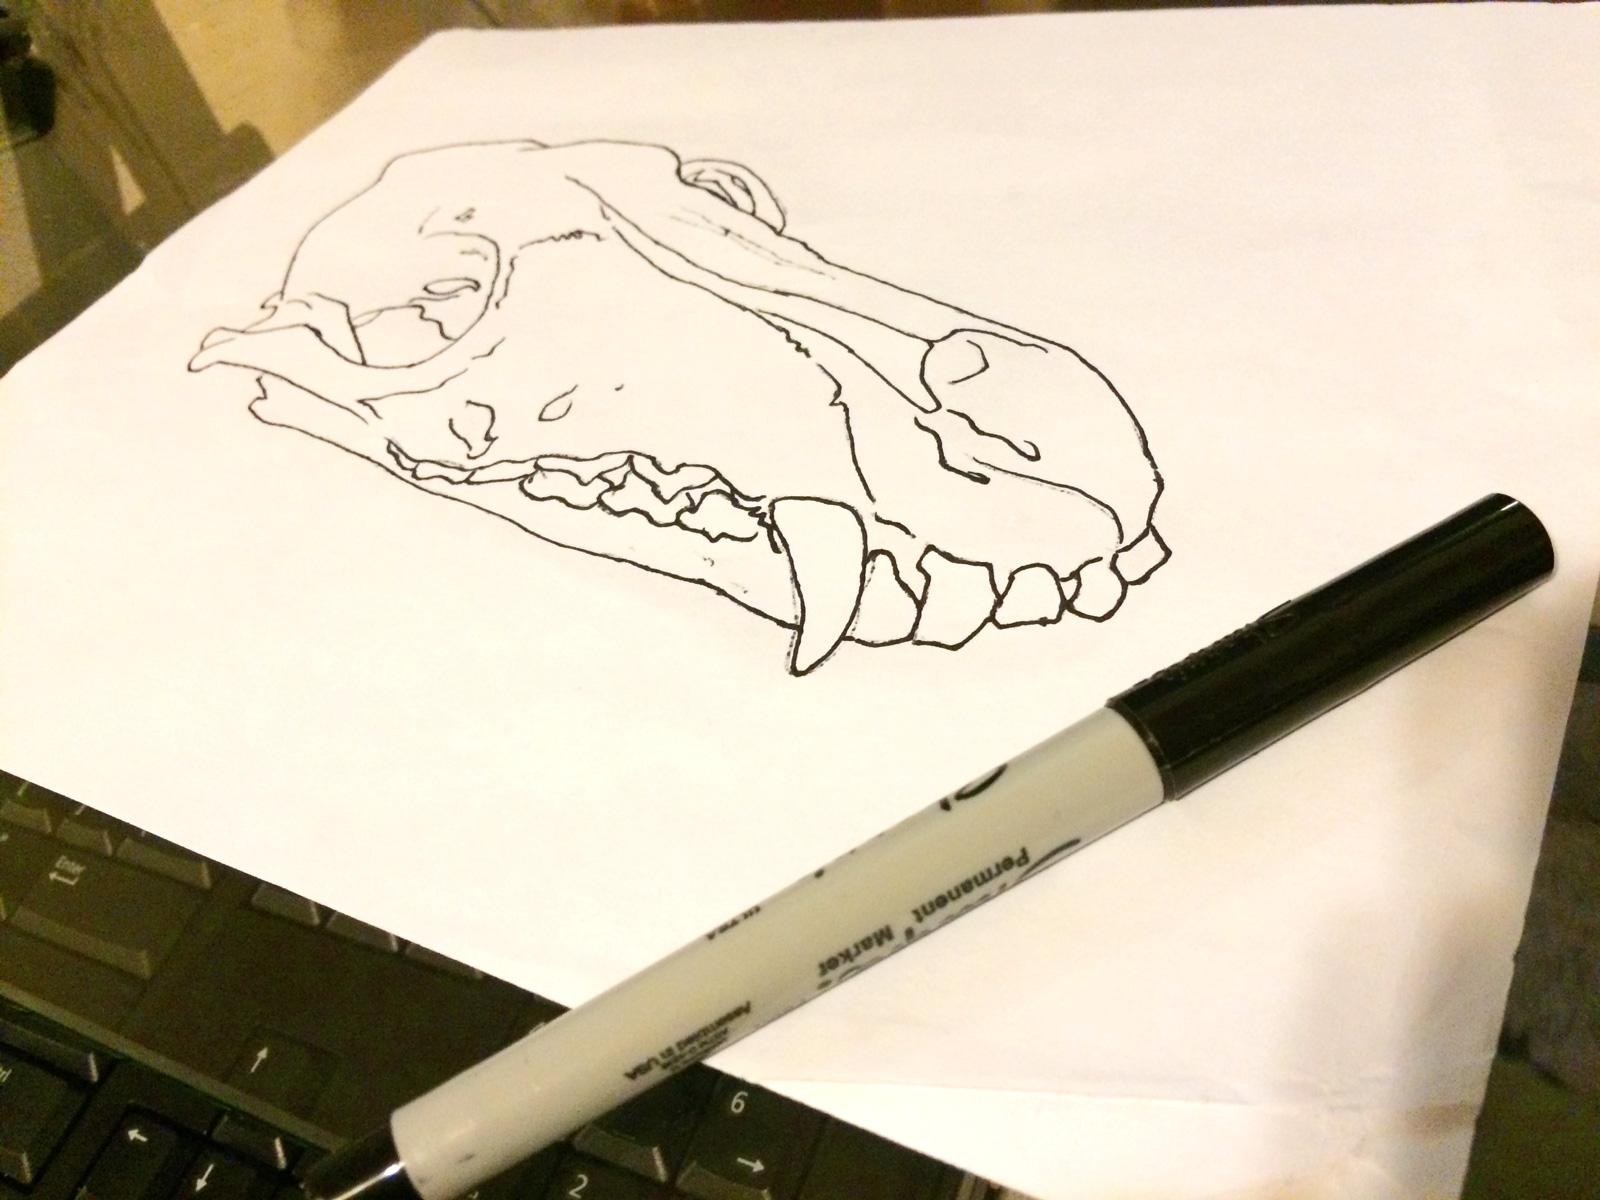 Sharpie_Sketch.jpg